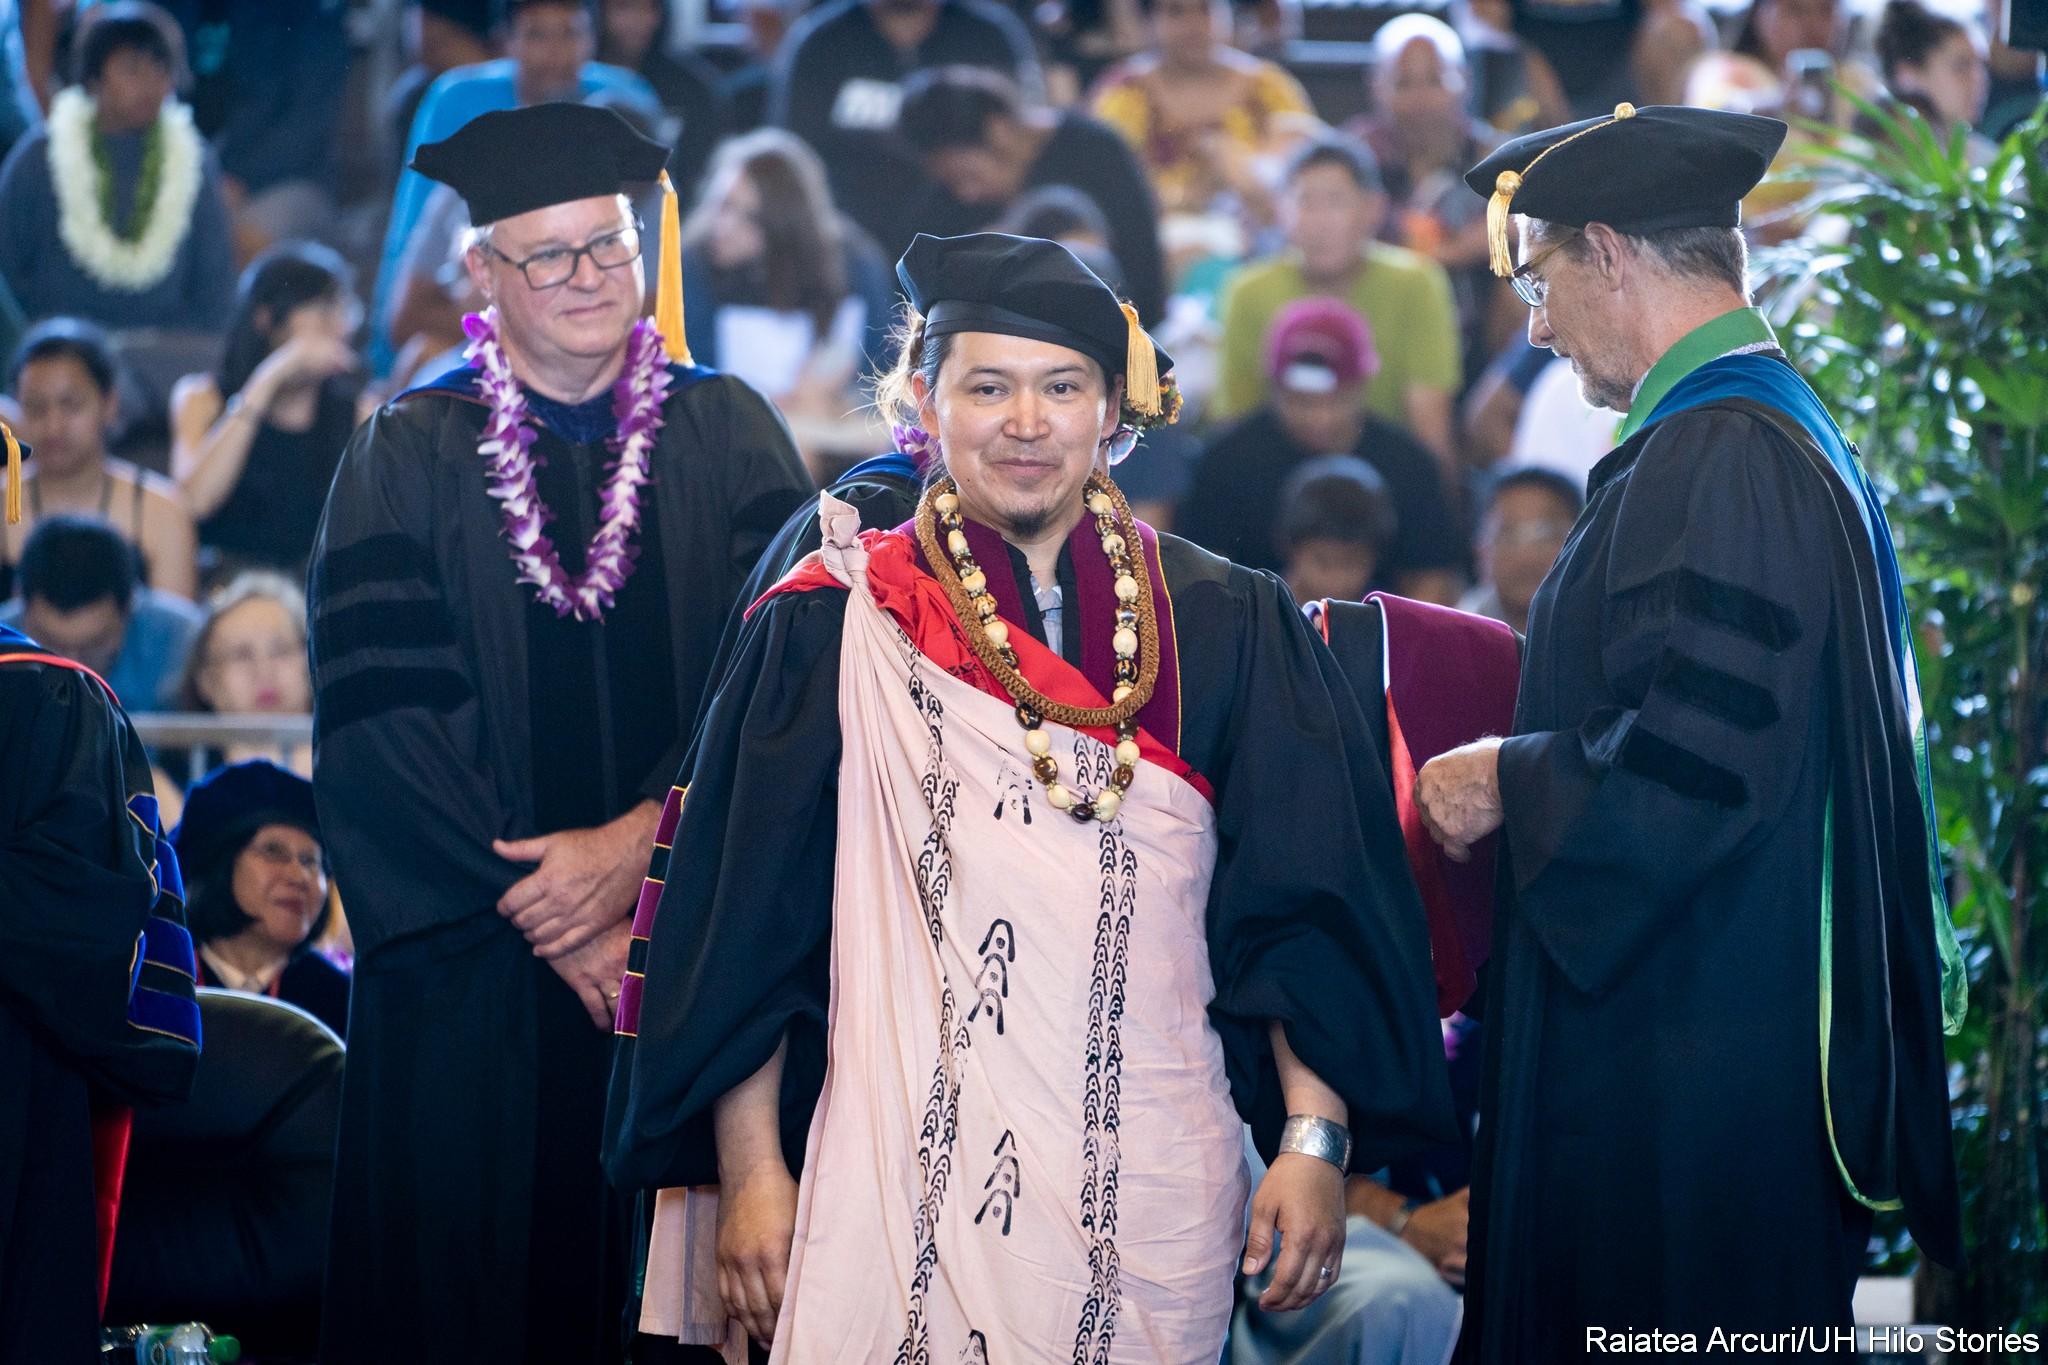 Officials adjust hood on a graduate.